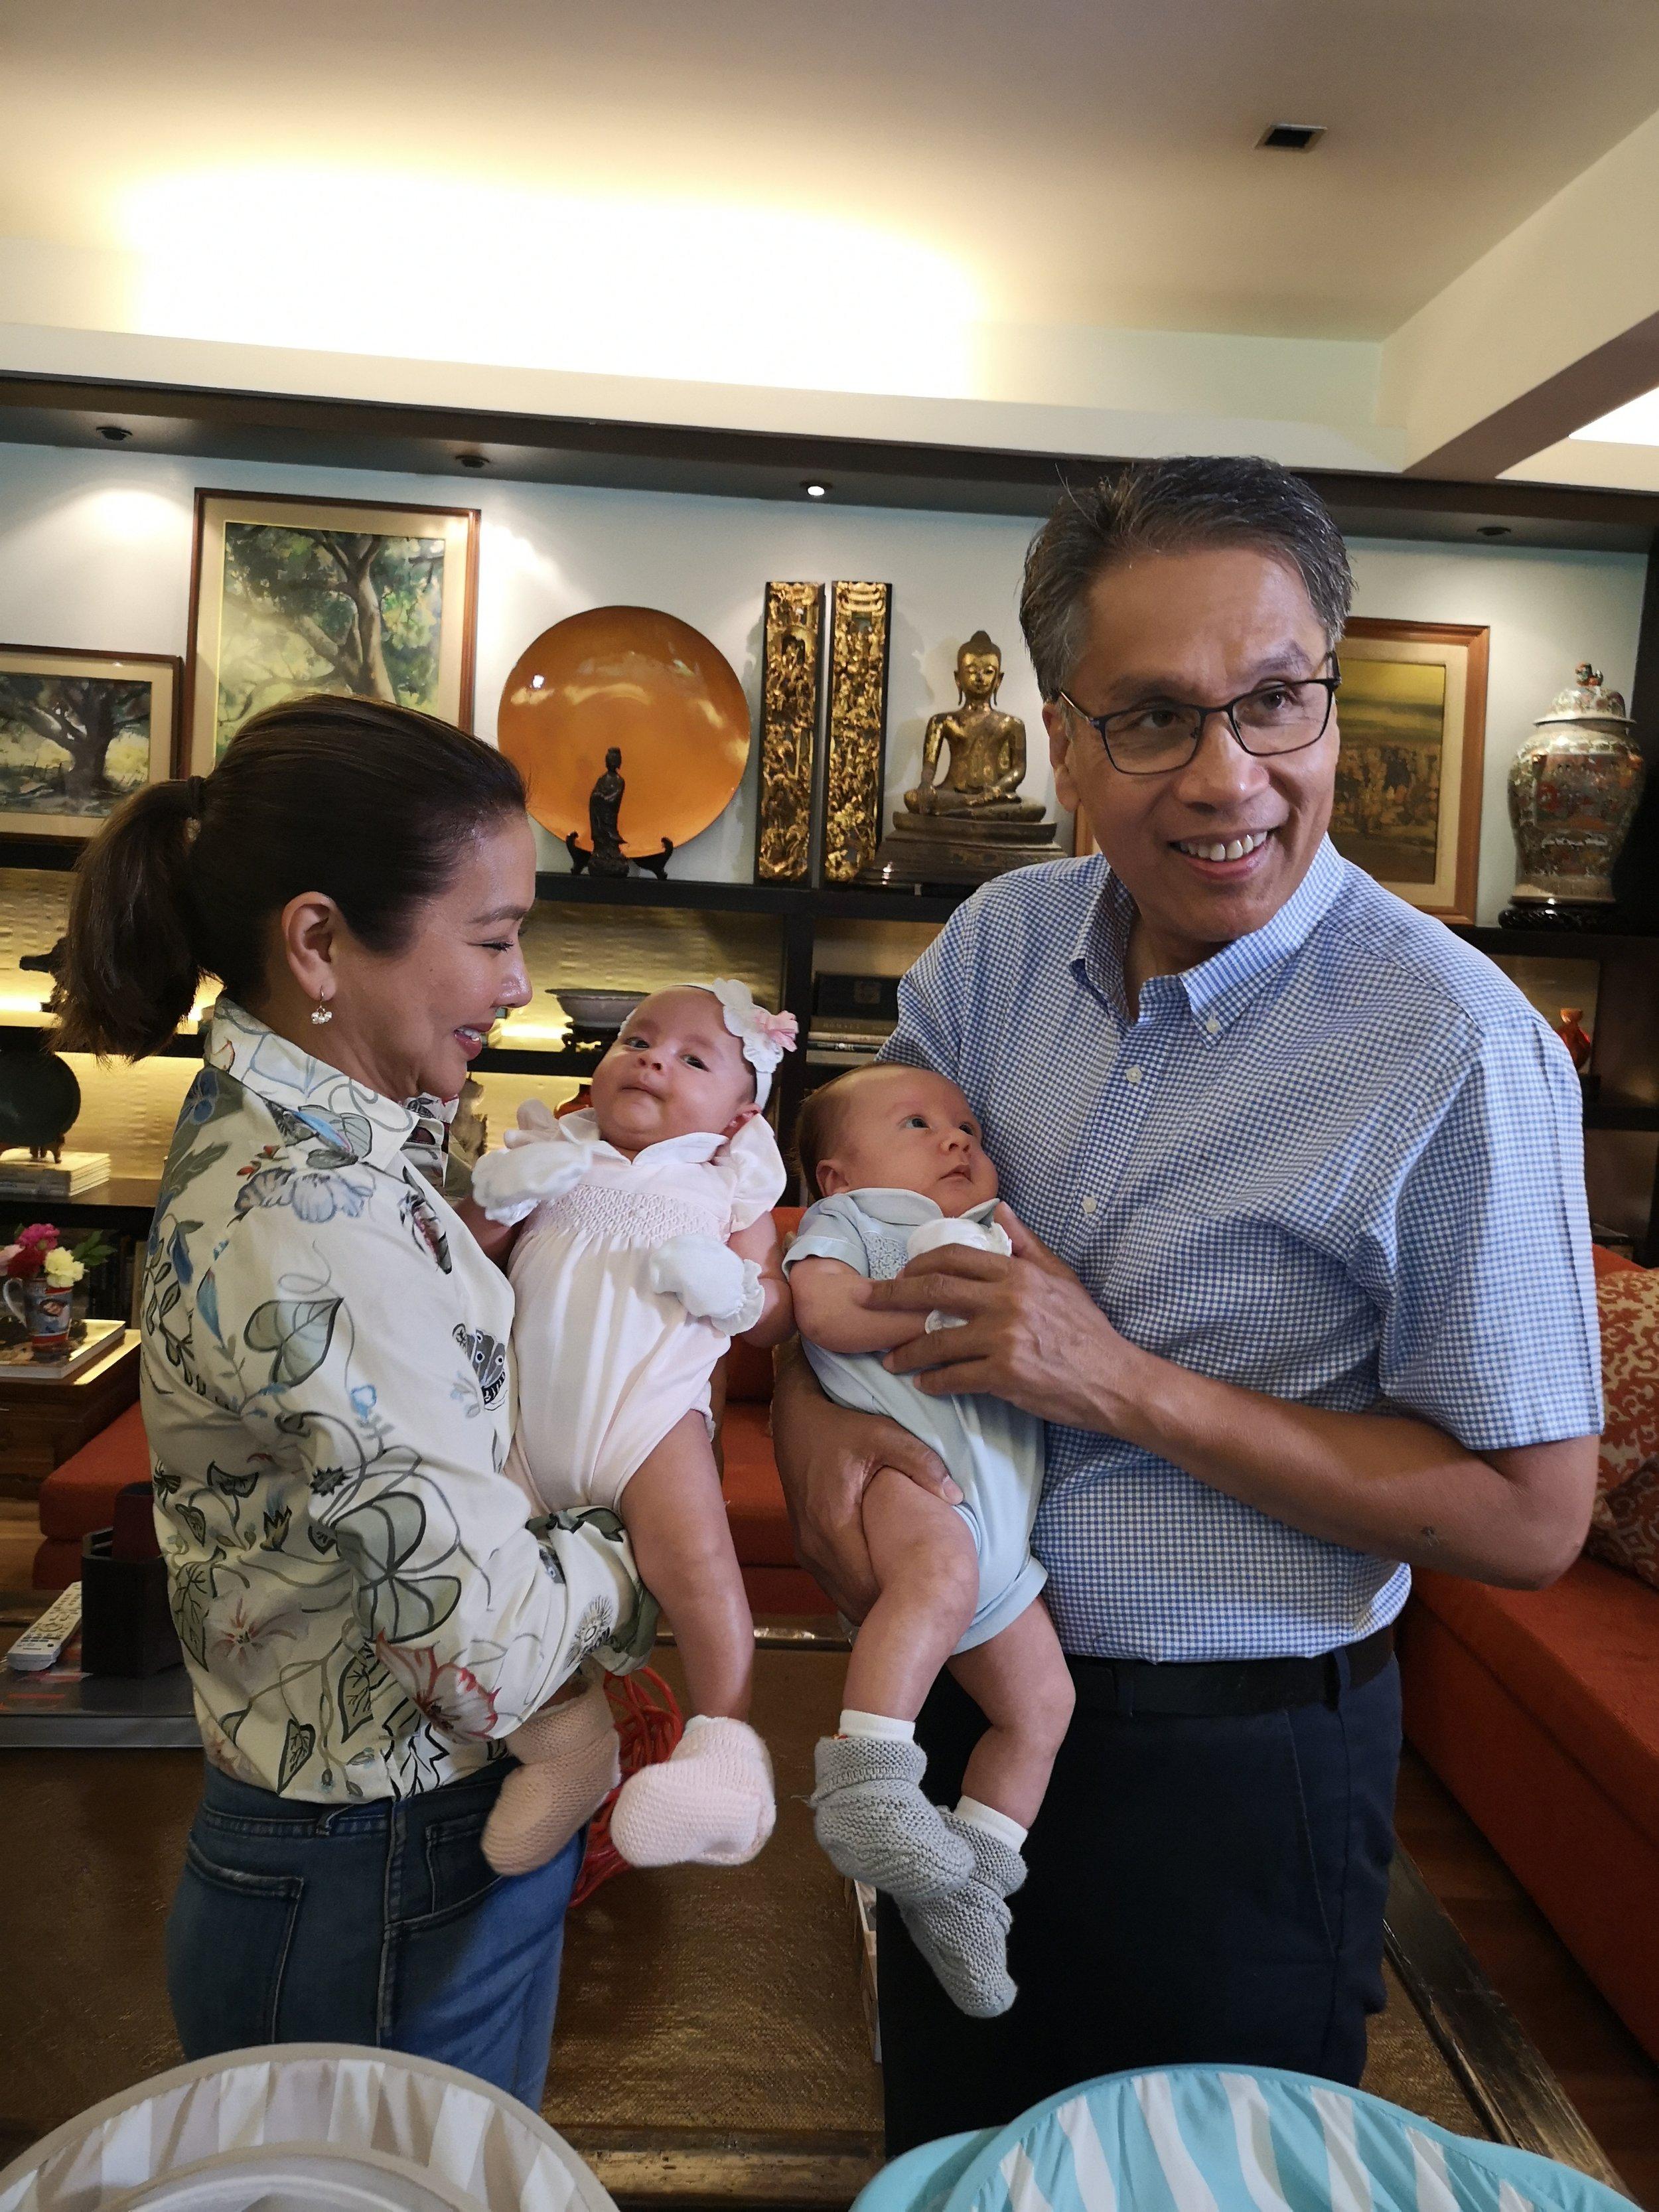 Couple Korina and Mar Roxas are proud parents of Pepe and Pilar